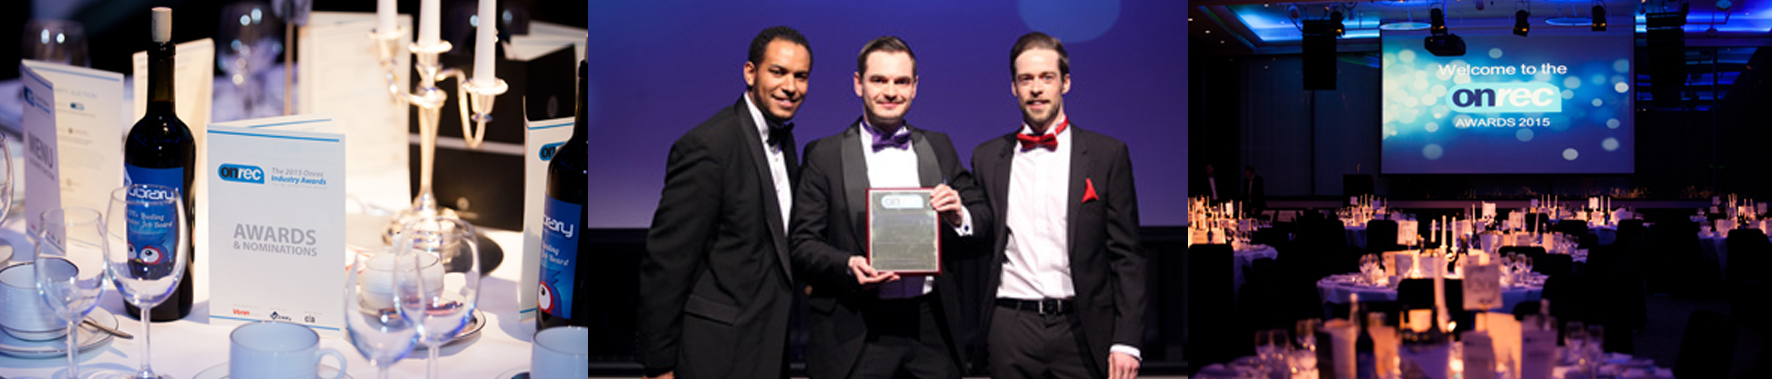 Onrec National Online Recruitment Awards 2015